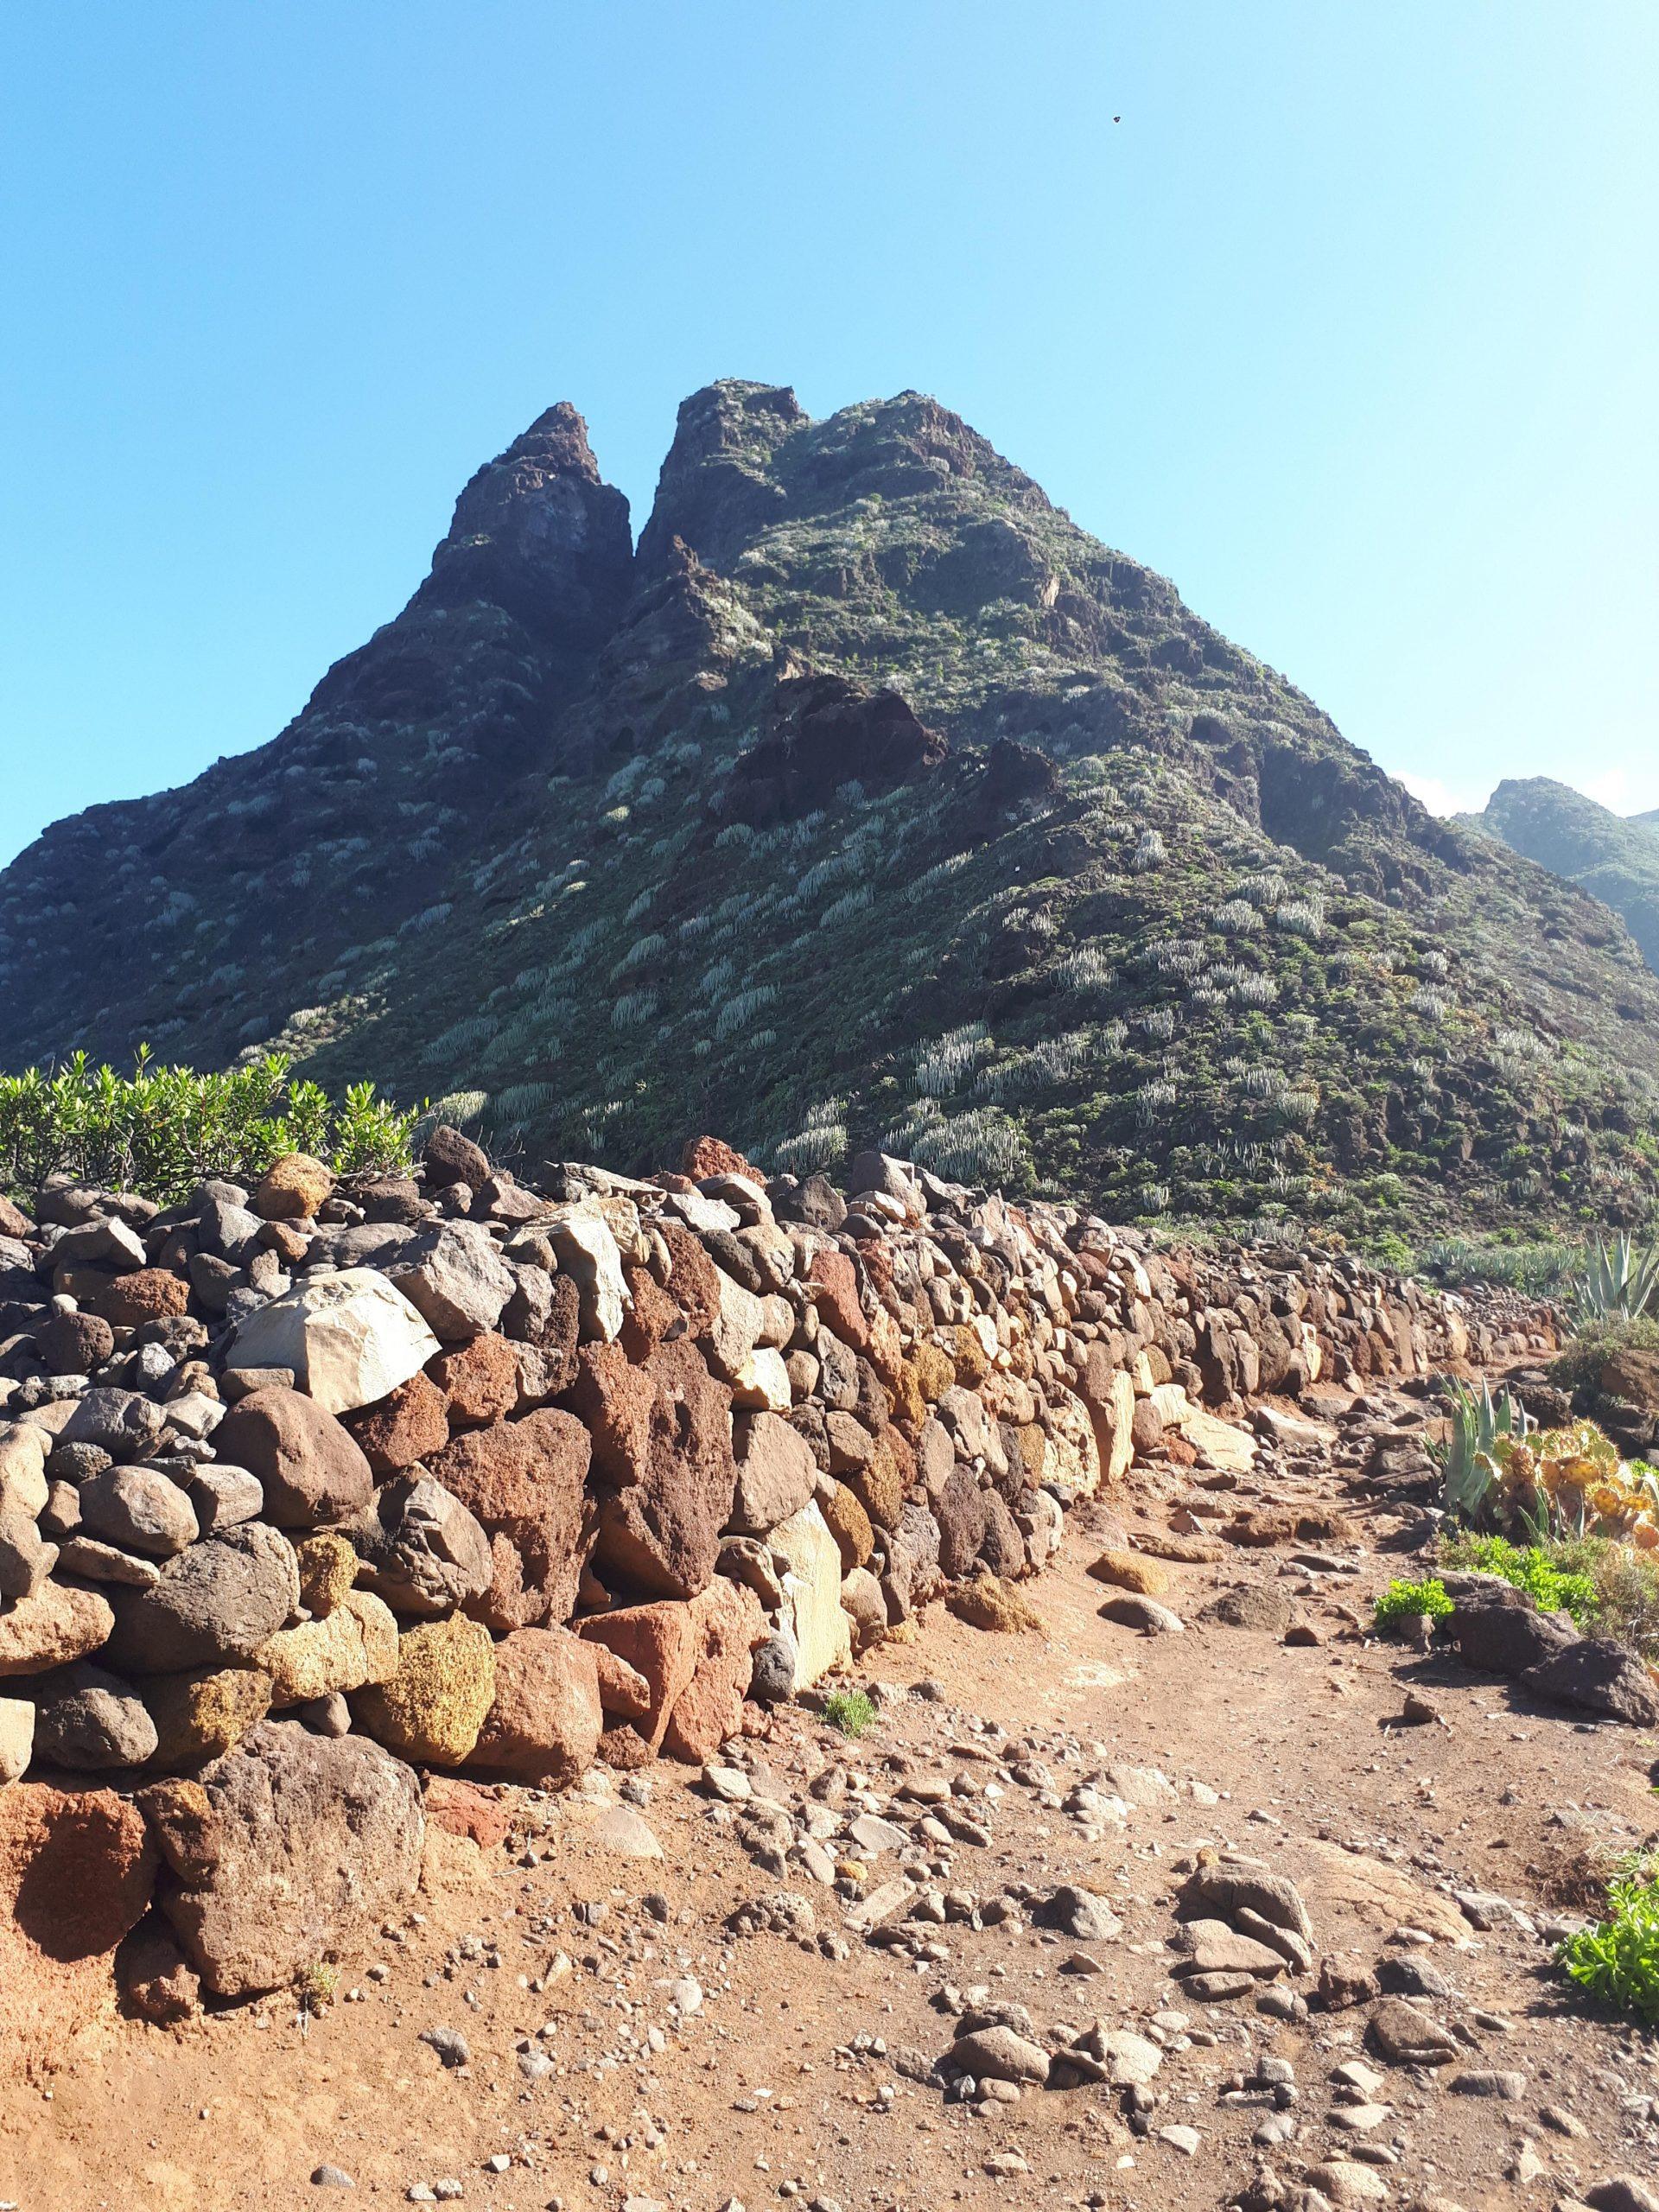 Wanderung Punta del Hidalgo Chinamada